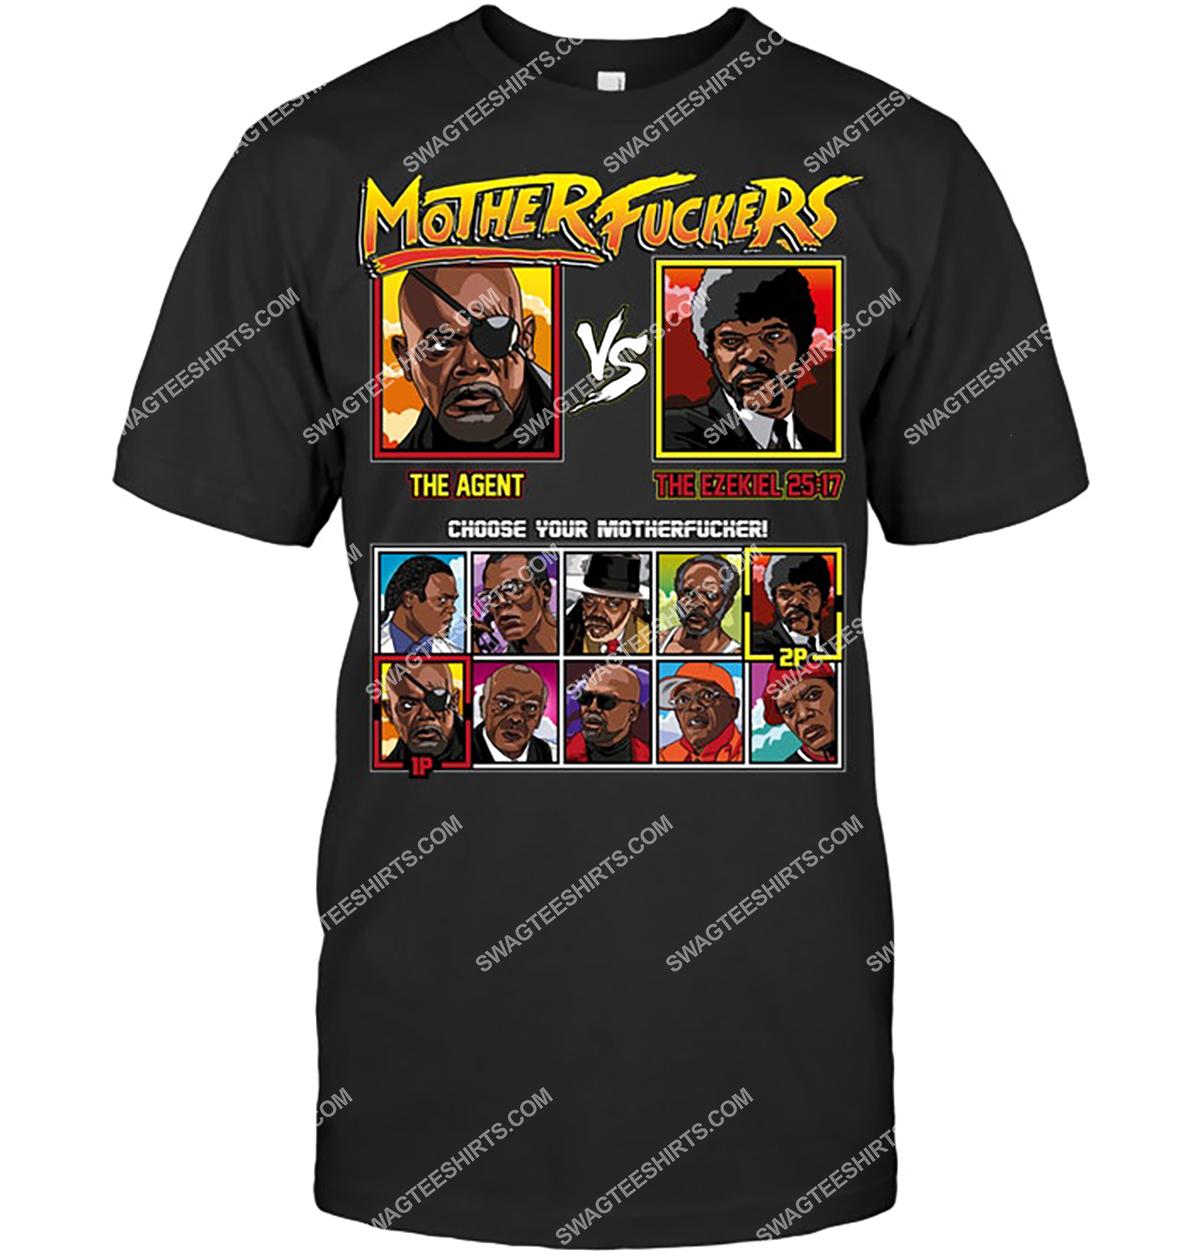 mother fuckers the agent vs the ezekiel choose your motherfucker tshirt 1